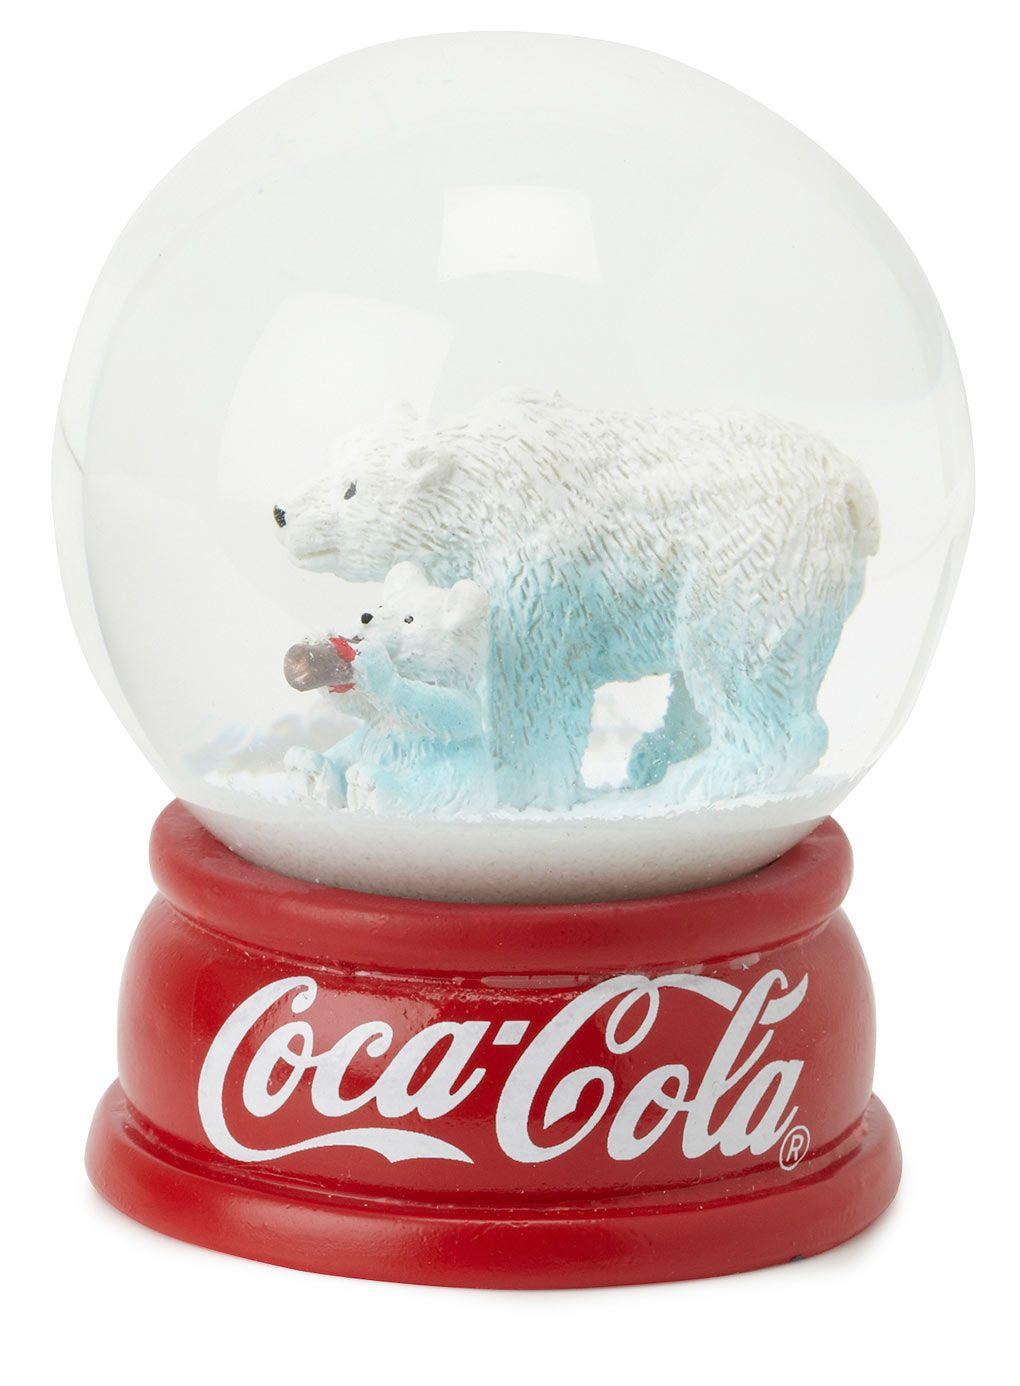 Globo de neve da Coca Cola.